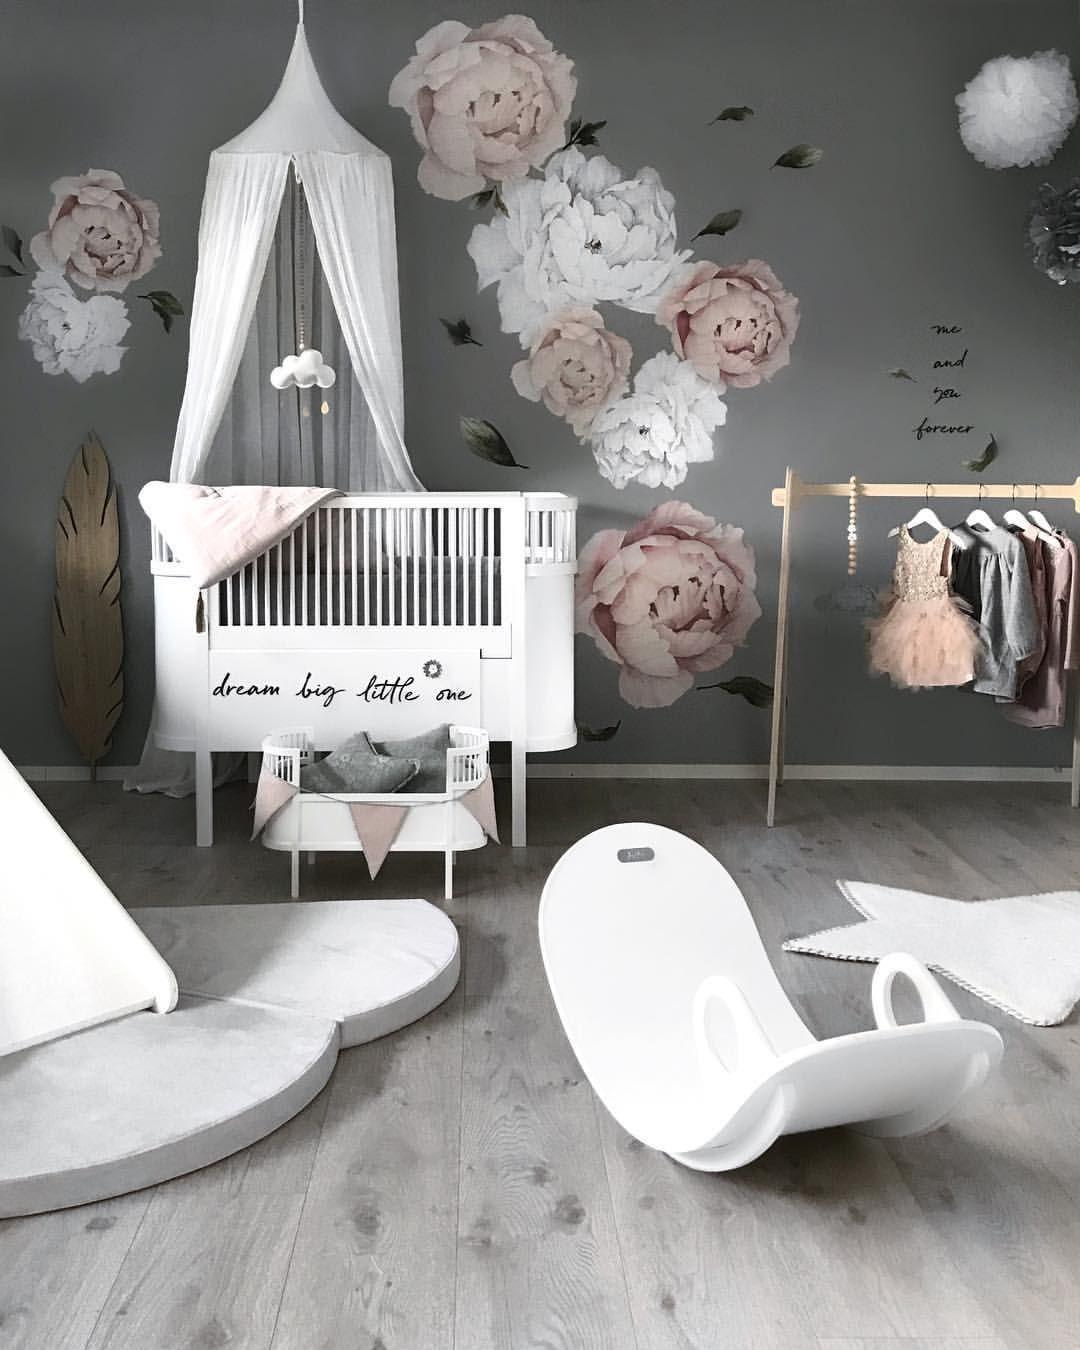 Déco chambre de bébé  Déco chambre bébé, Décoration chambre bébé